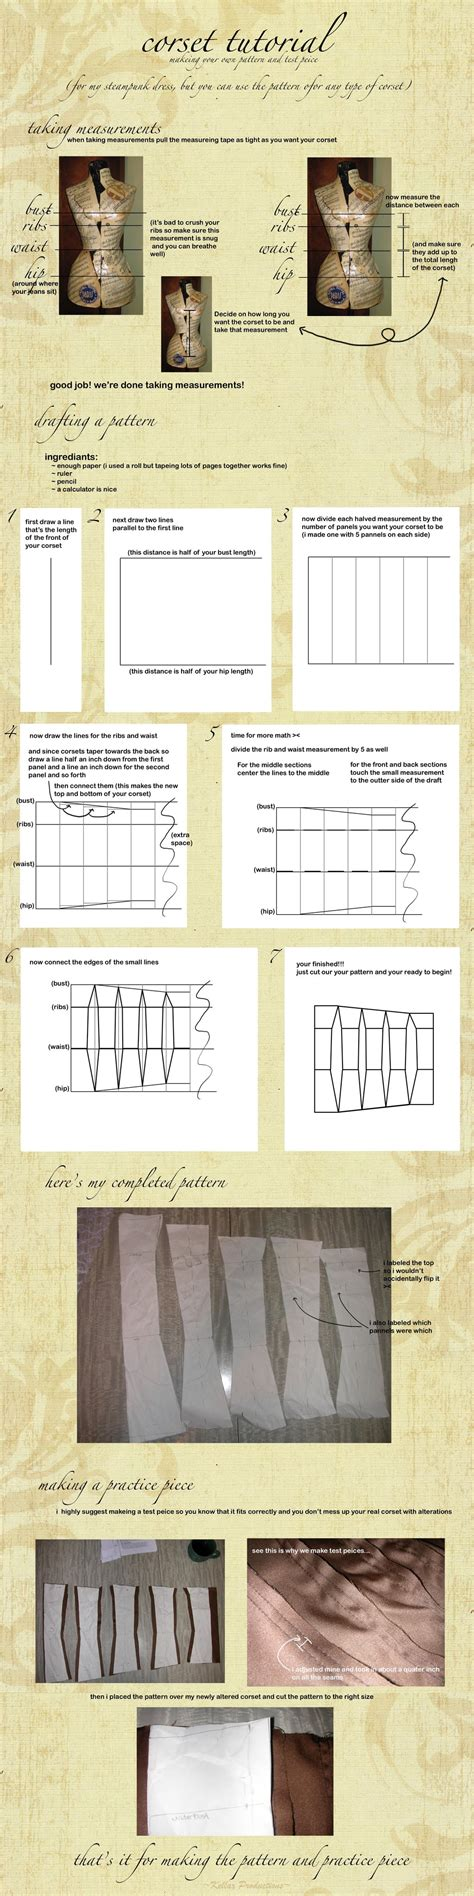 easy pattern drafting tutorial corset pattern drafting tutorial by kellaxproductions on